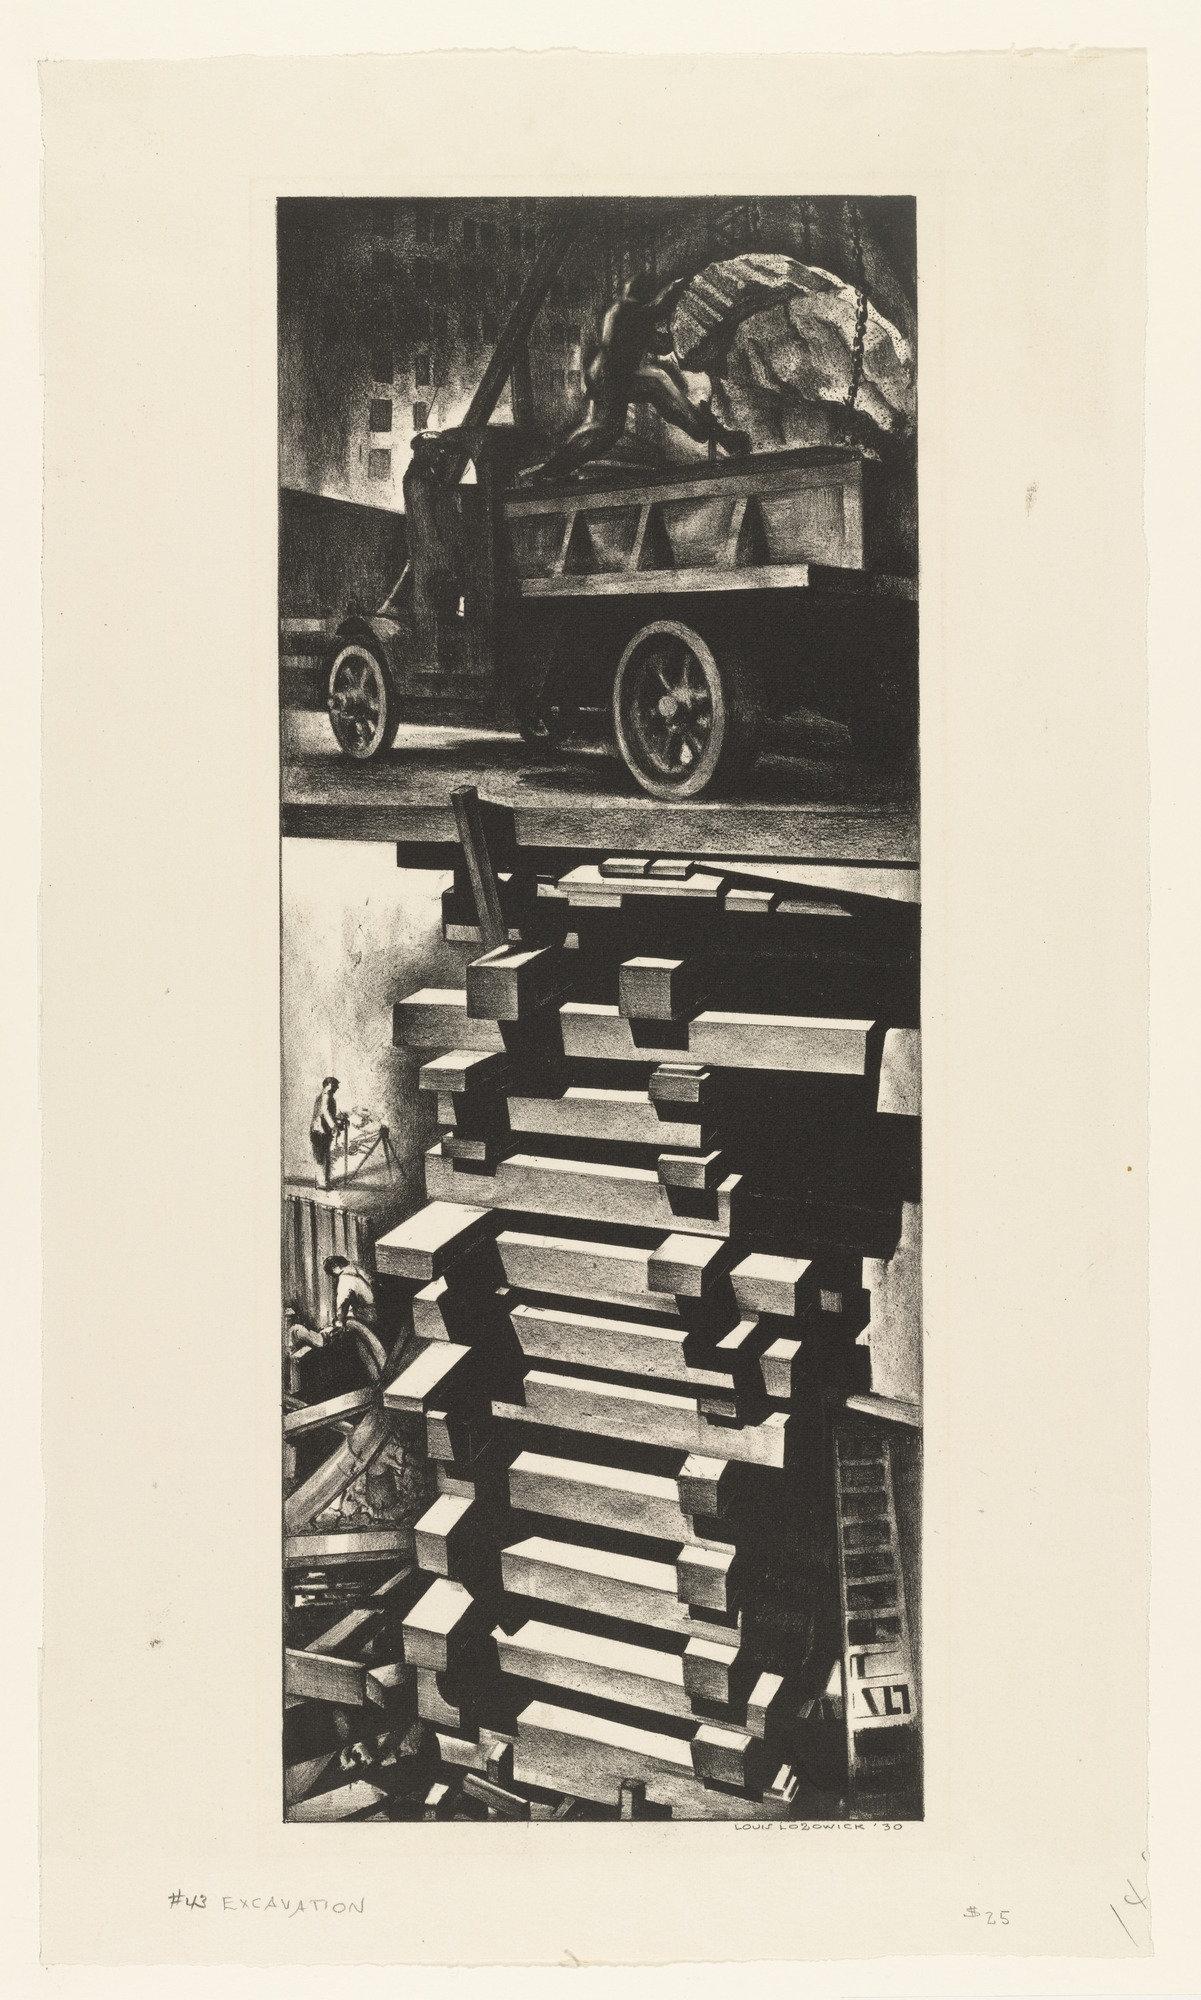 Louis Lozowick Construction 1930